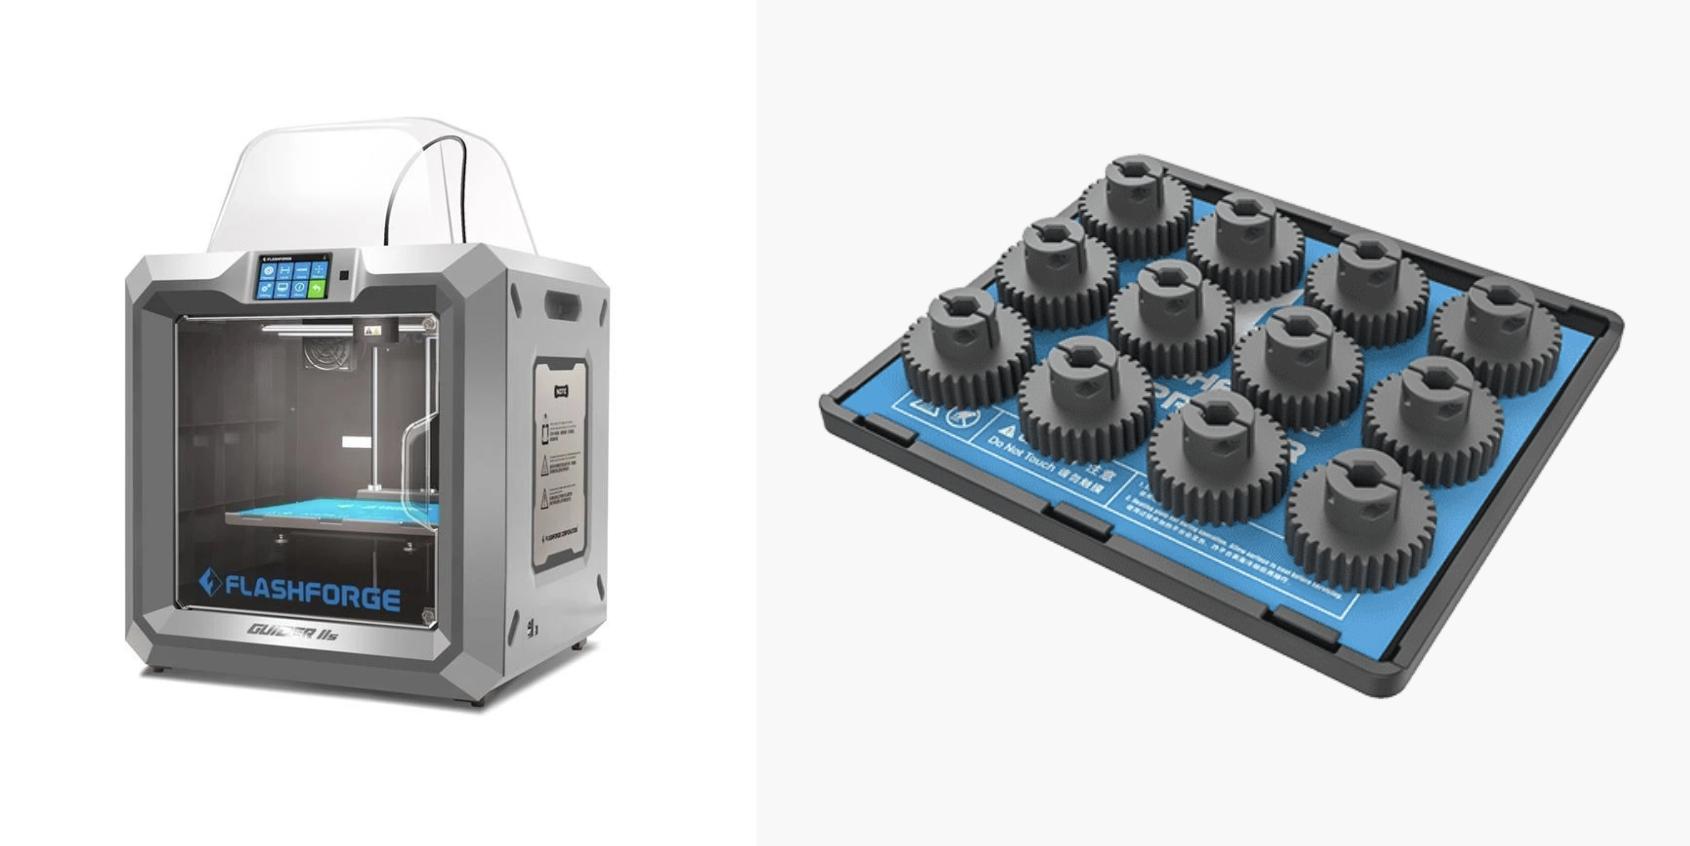 Flashforge Guider IIS: A large desktop 3D printer for low-volume production